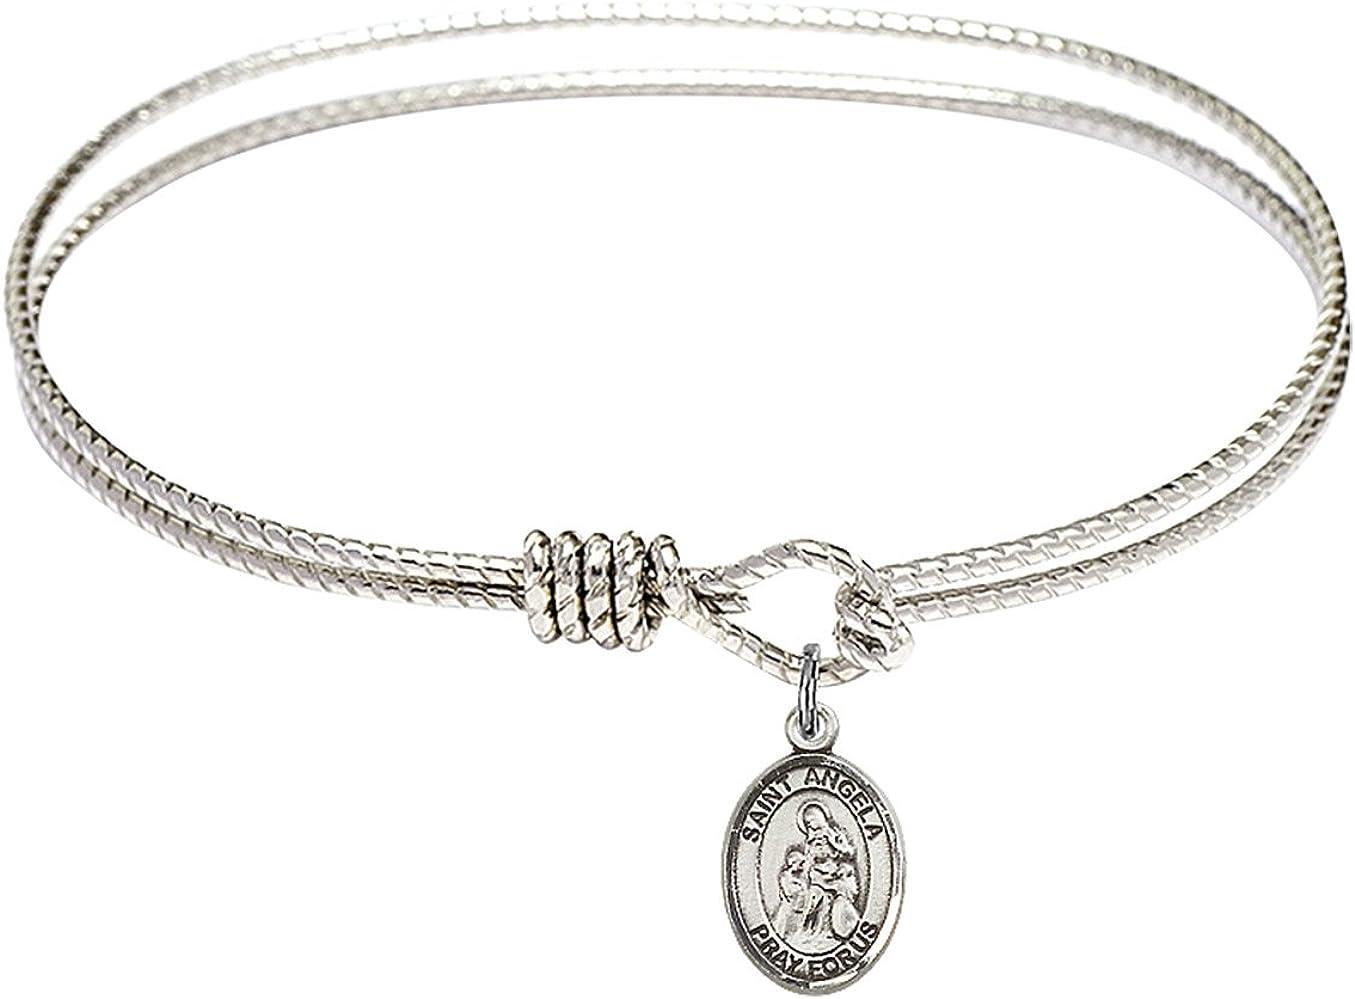 Bonyak Fees free!! Jewelry Oval Eye Hook Bangle w Angela Ranking TOP1 Bracelet St. Merici